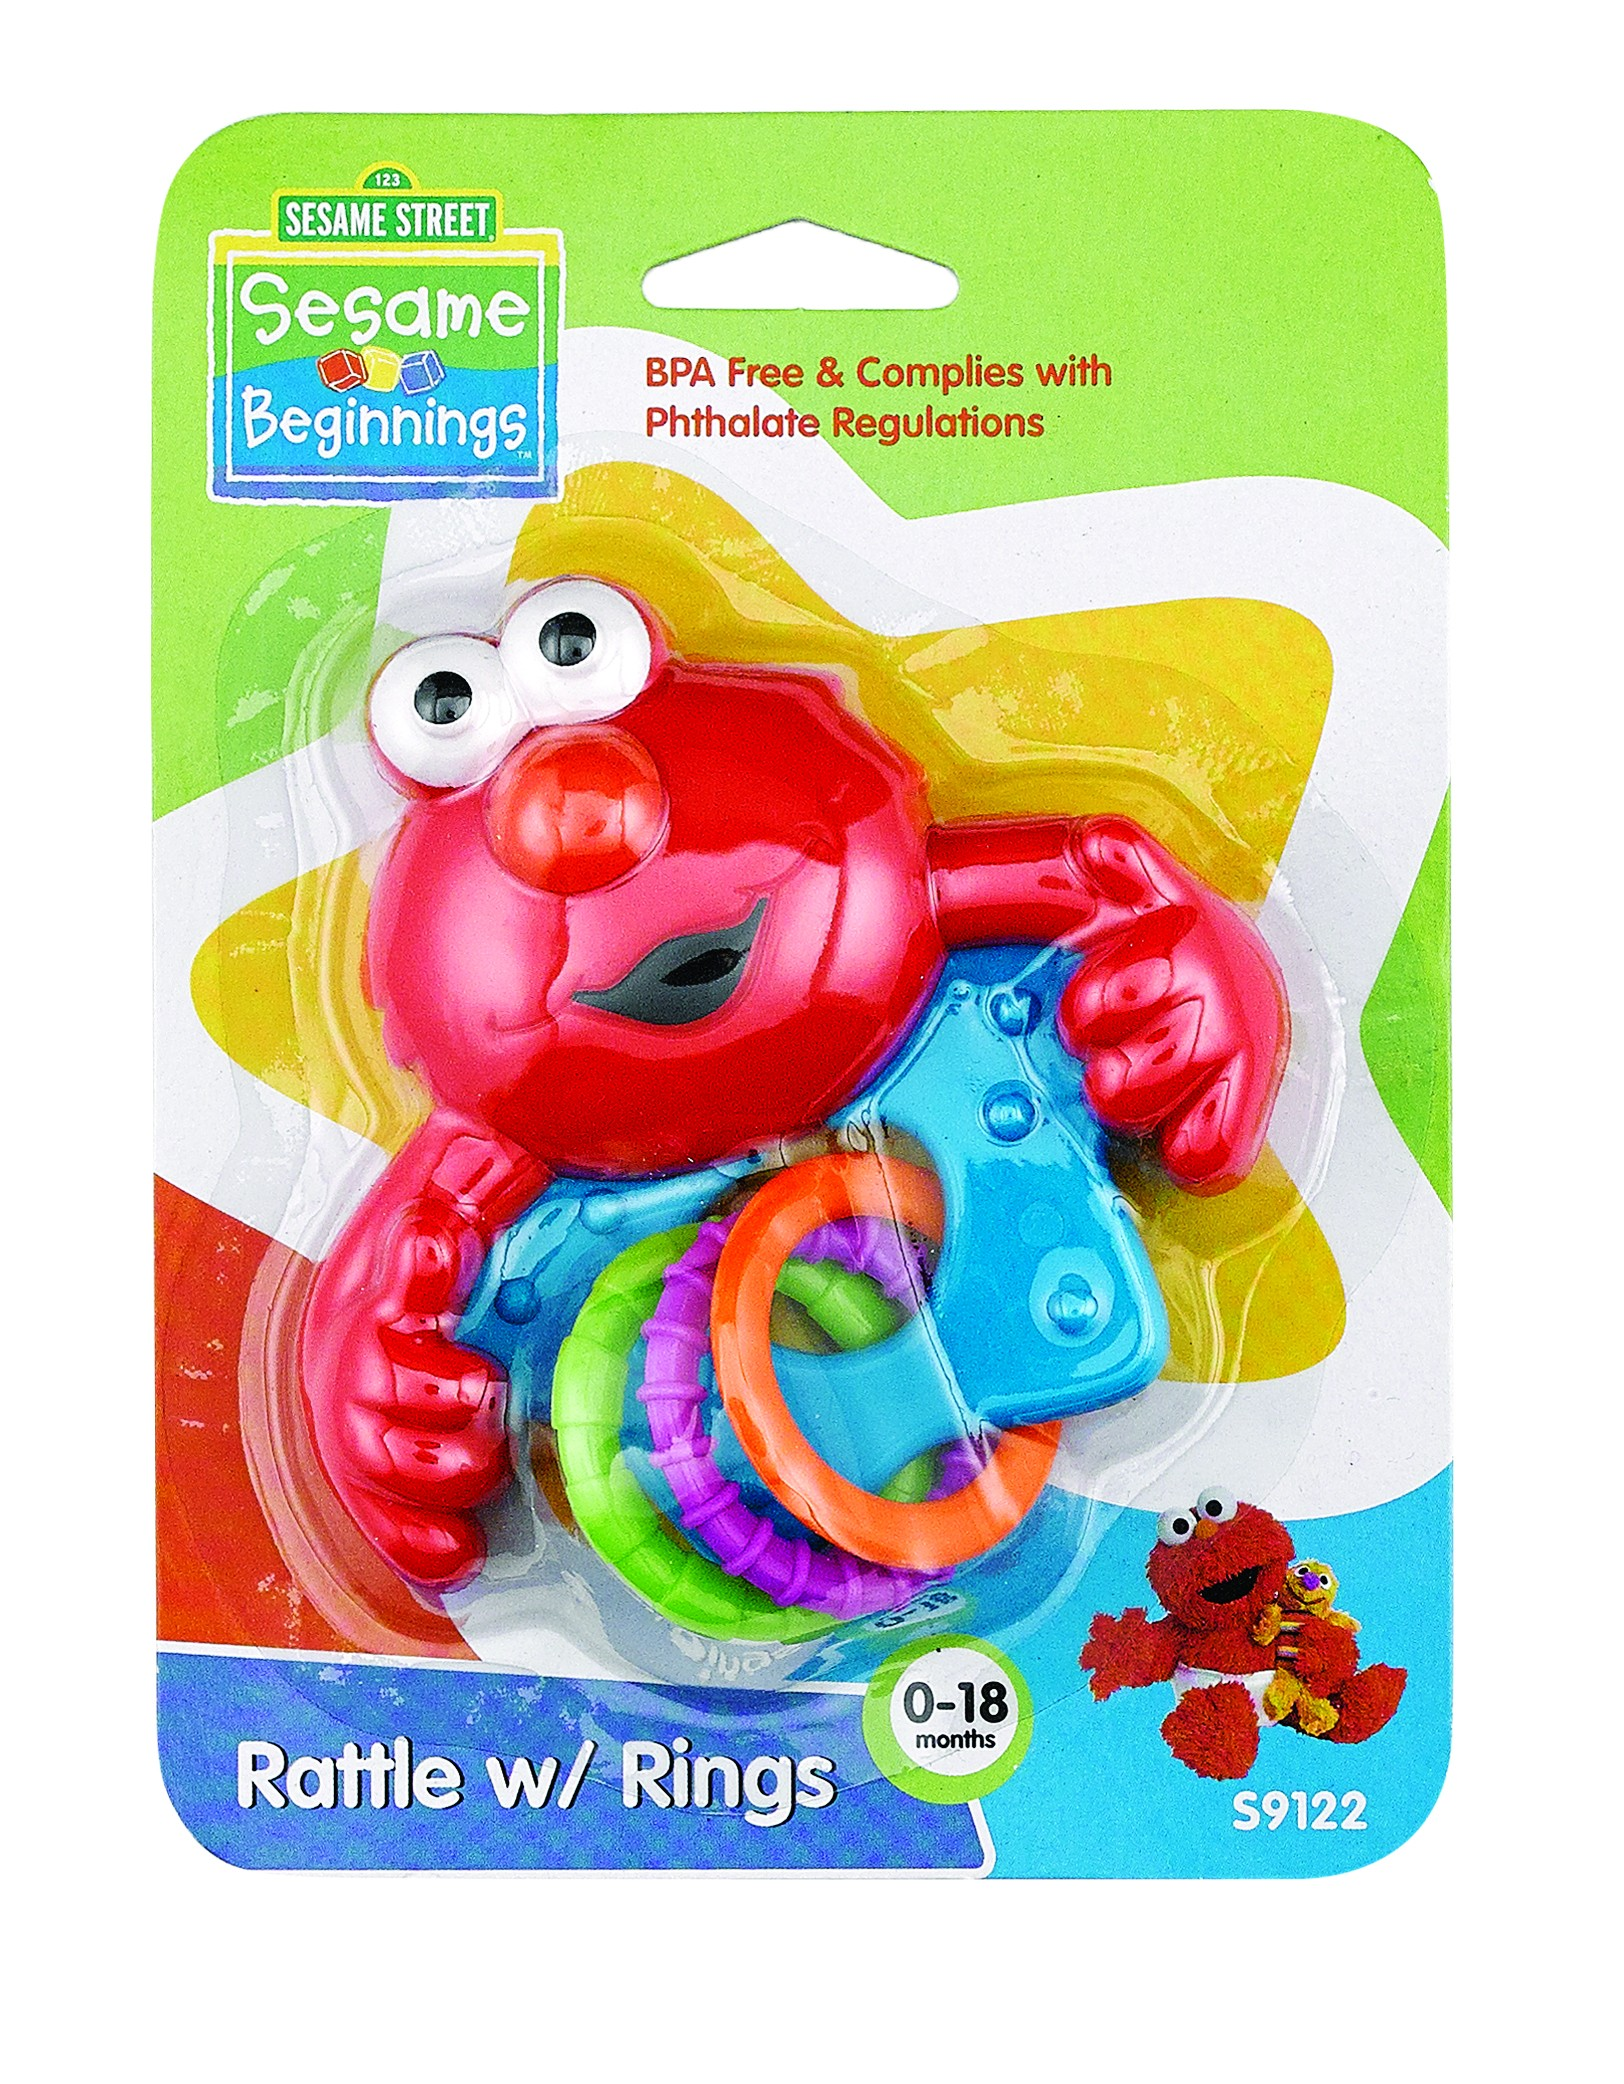 Sesame Street Rattle